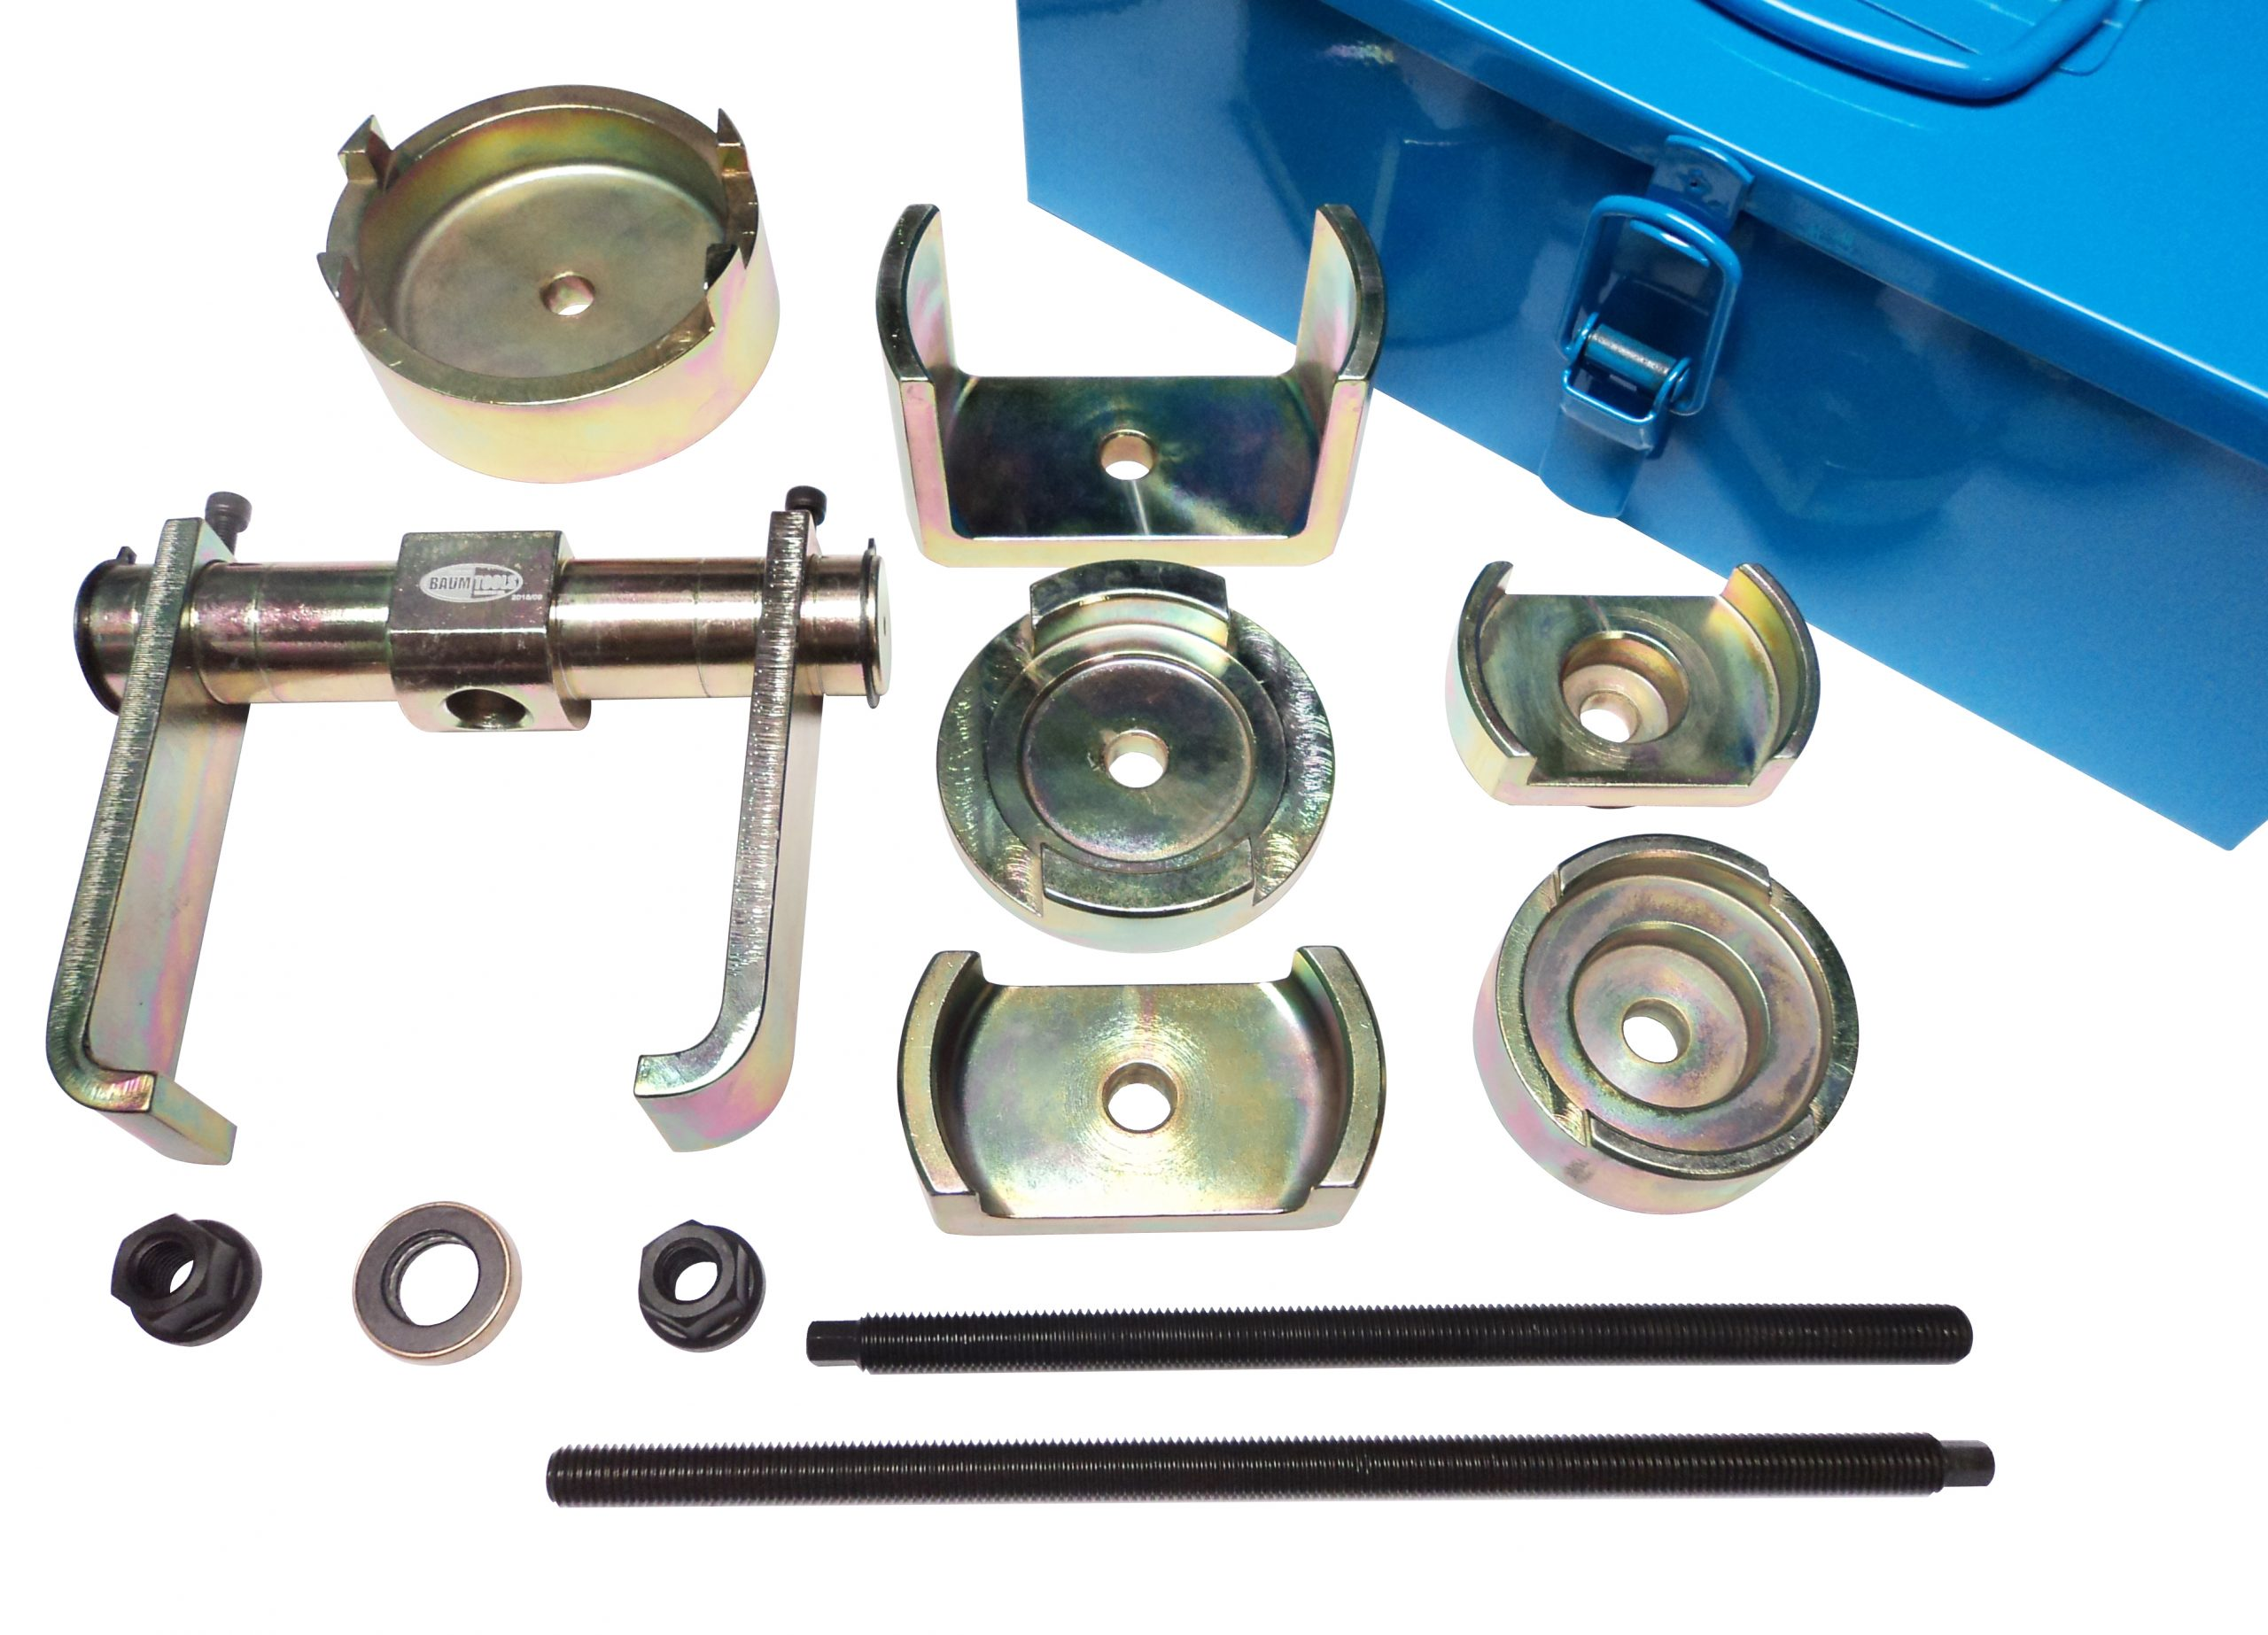 B204-0043 204 Rear Subframe Bushing R&I Tool Kit